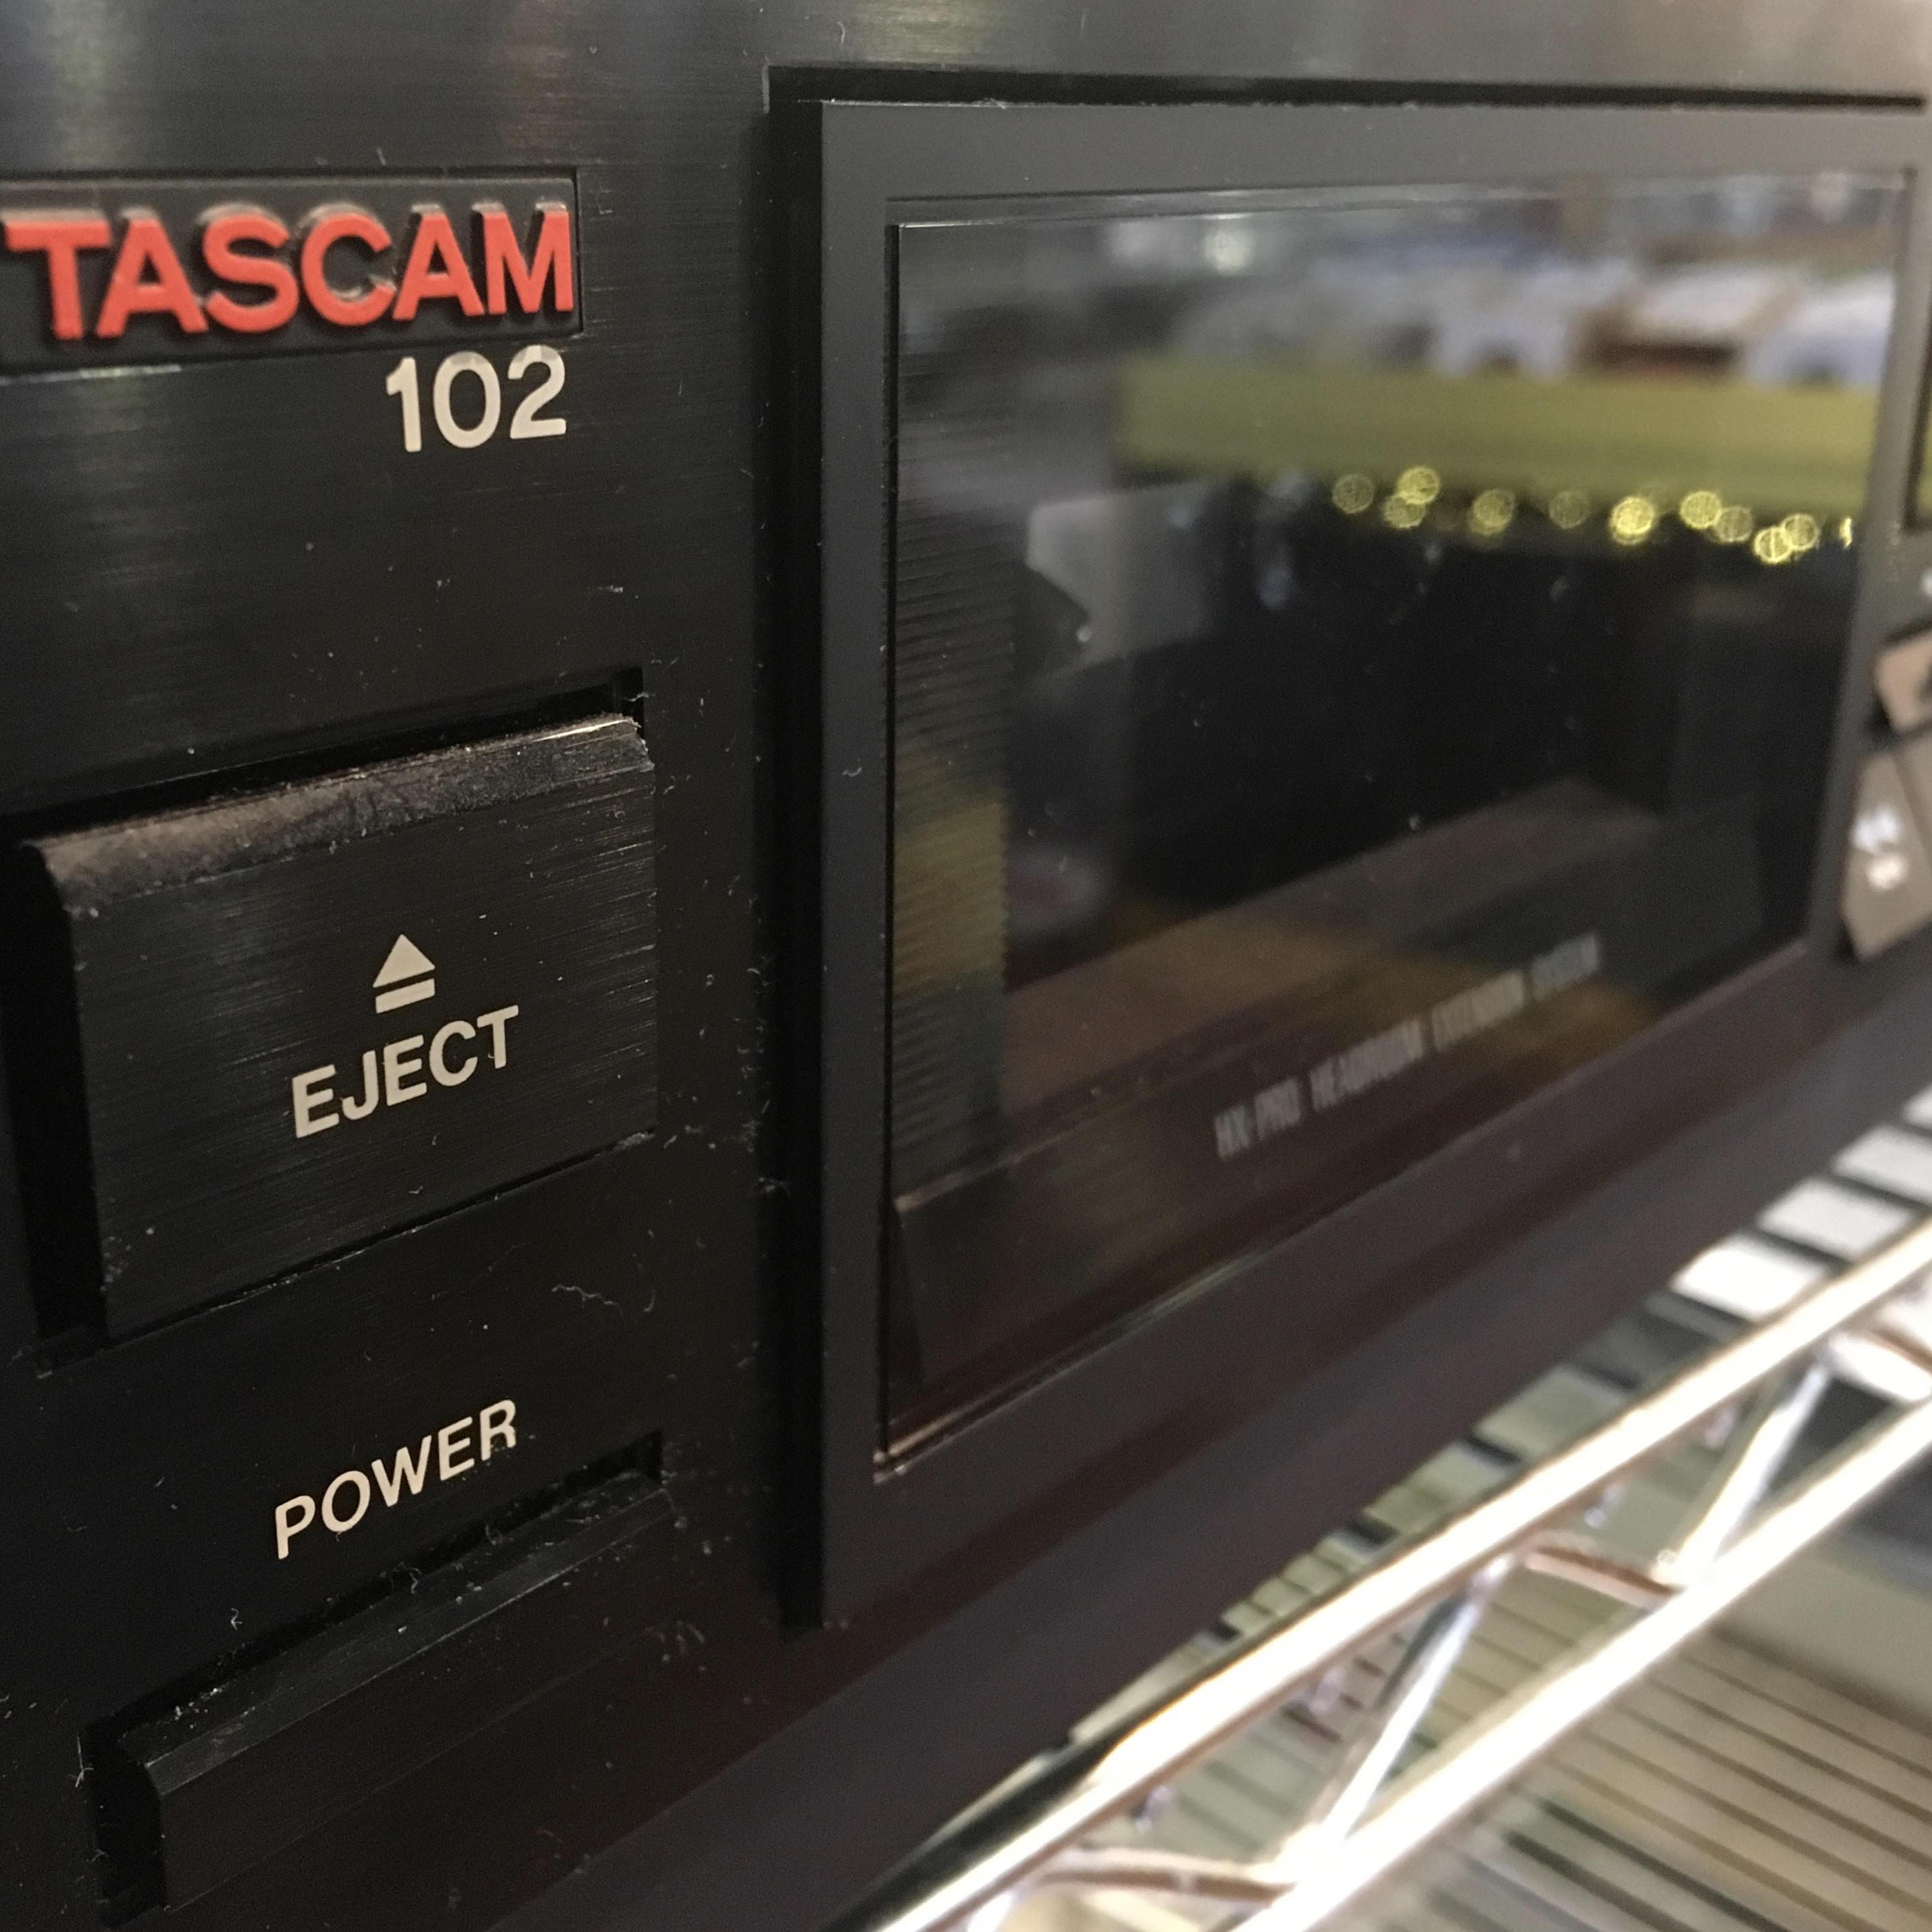 TASCAM 102 CASSETTE DECK! – Horizon Records